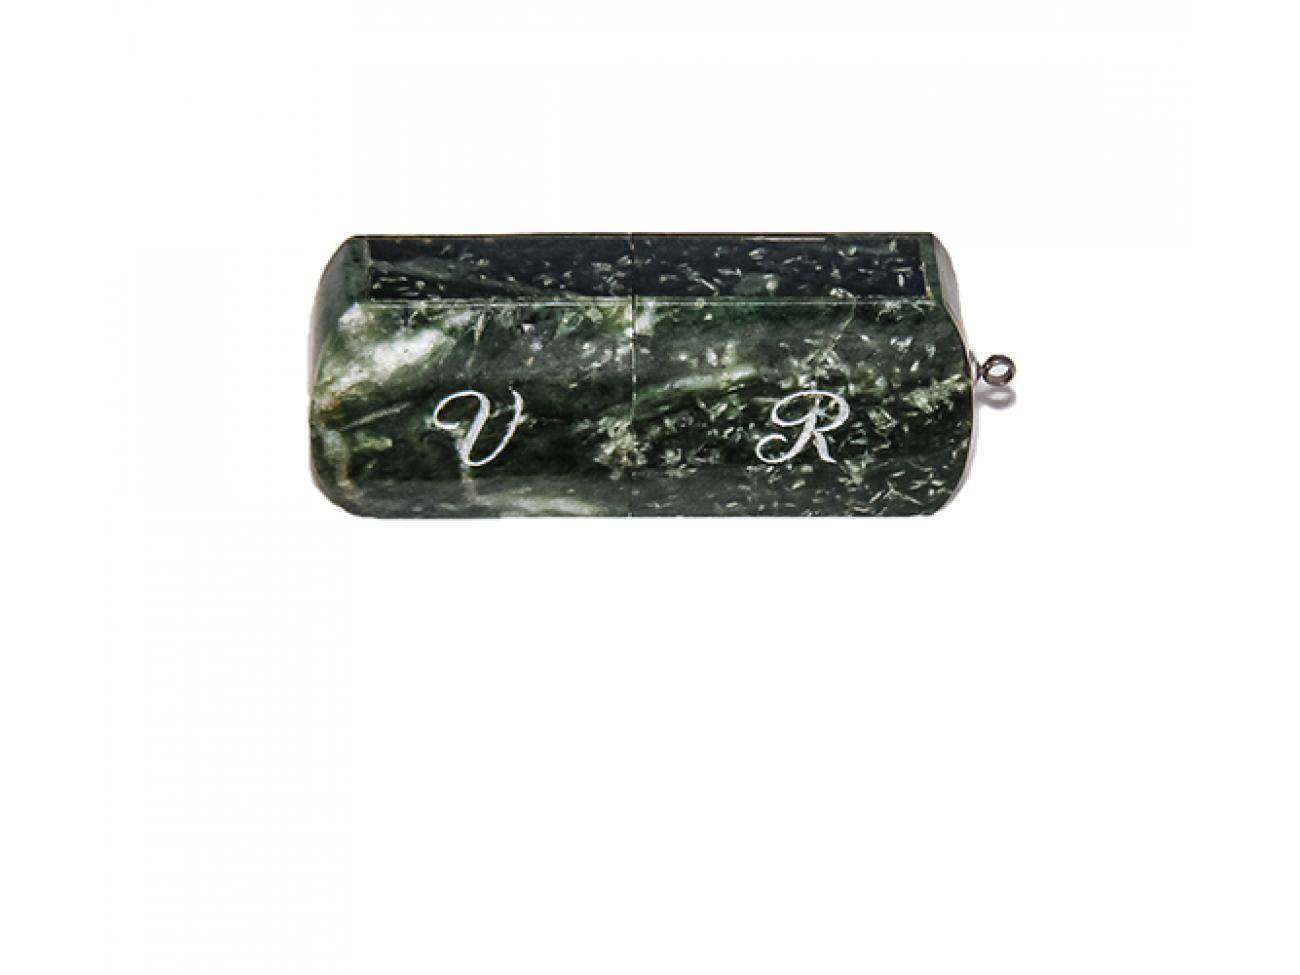 Флешка из камня Vöhringer USB 2.0 16 GB